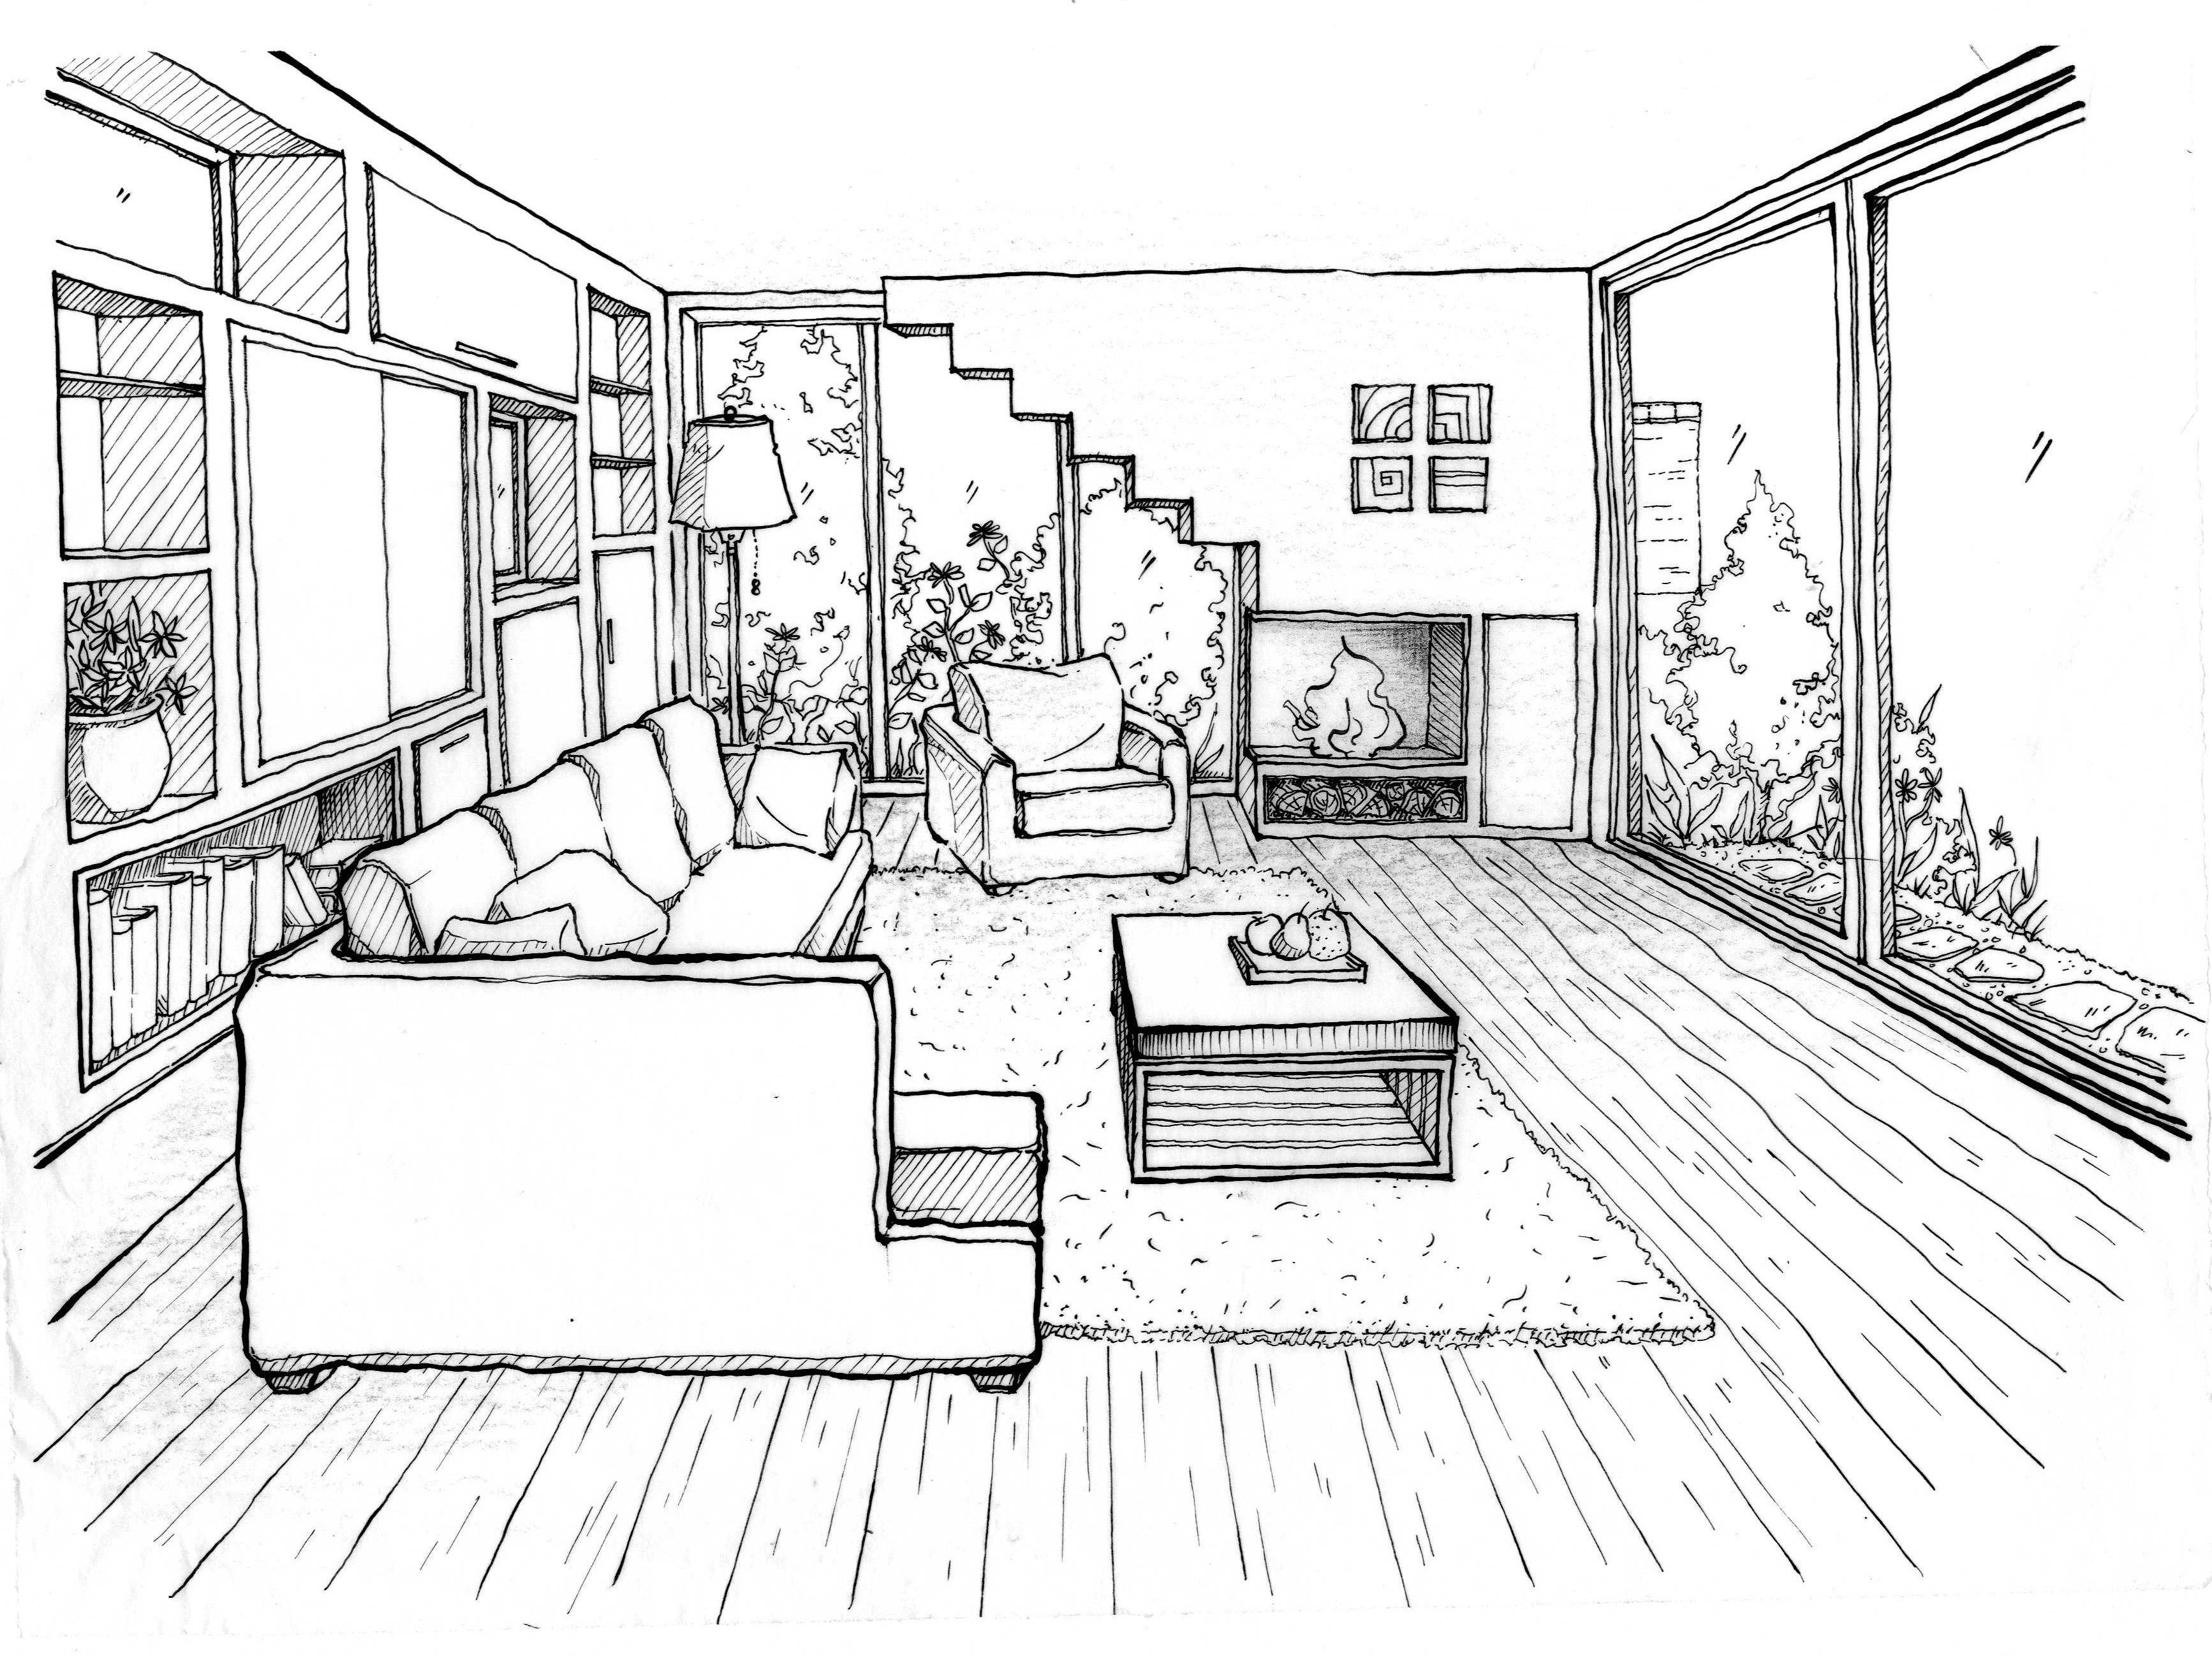 visual narrative inspiration // perspective drawing living